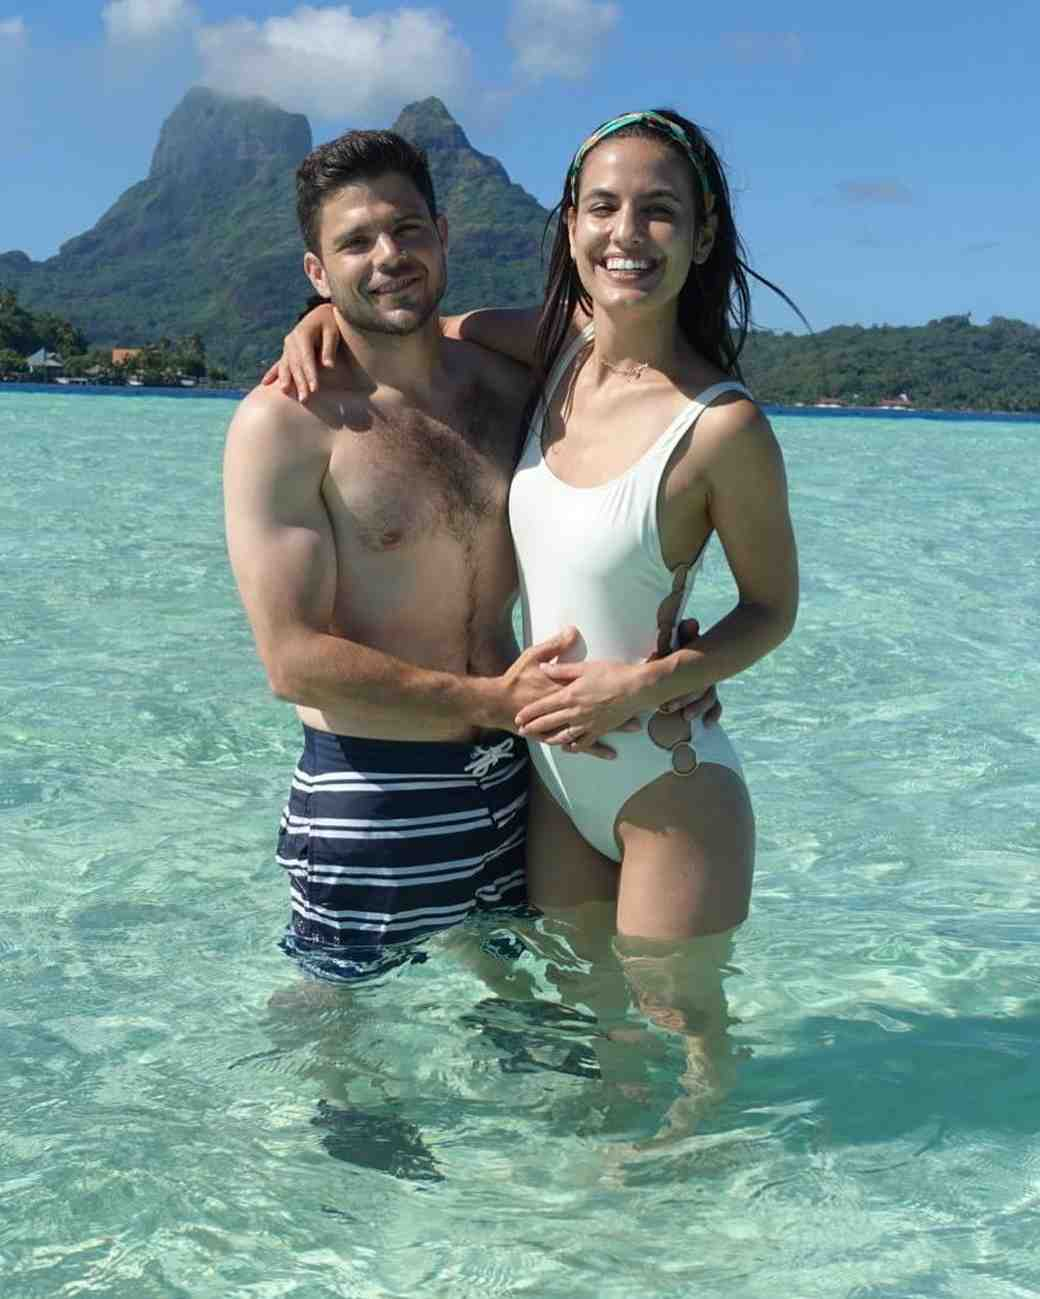 Jerry Ferrara and Breanne Racano on Bora Bora honeymoon